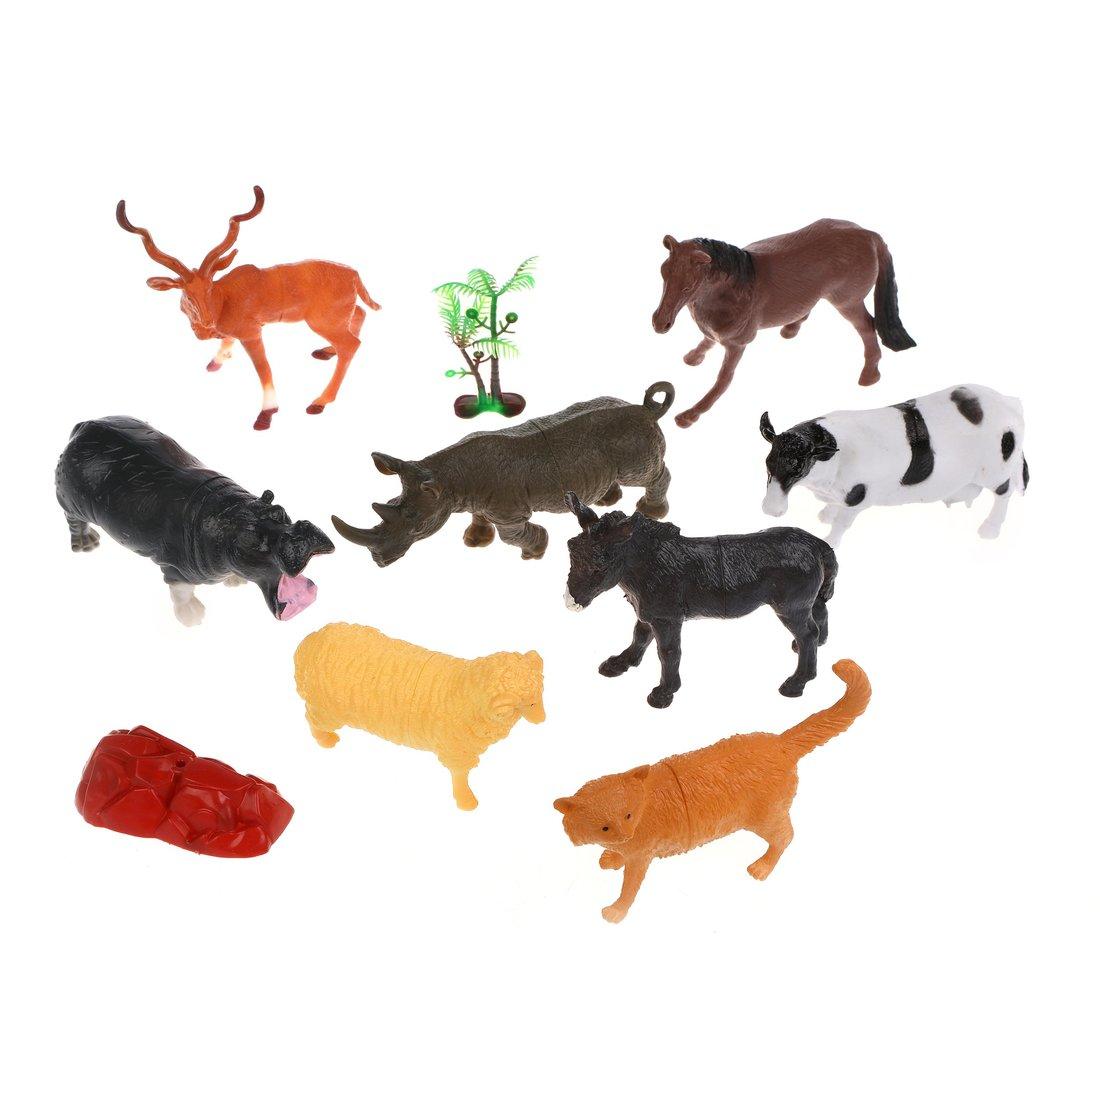 Набор животных, 8 шт., аксессуары, пакет